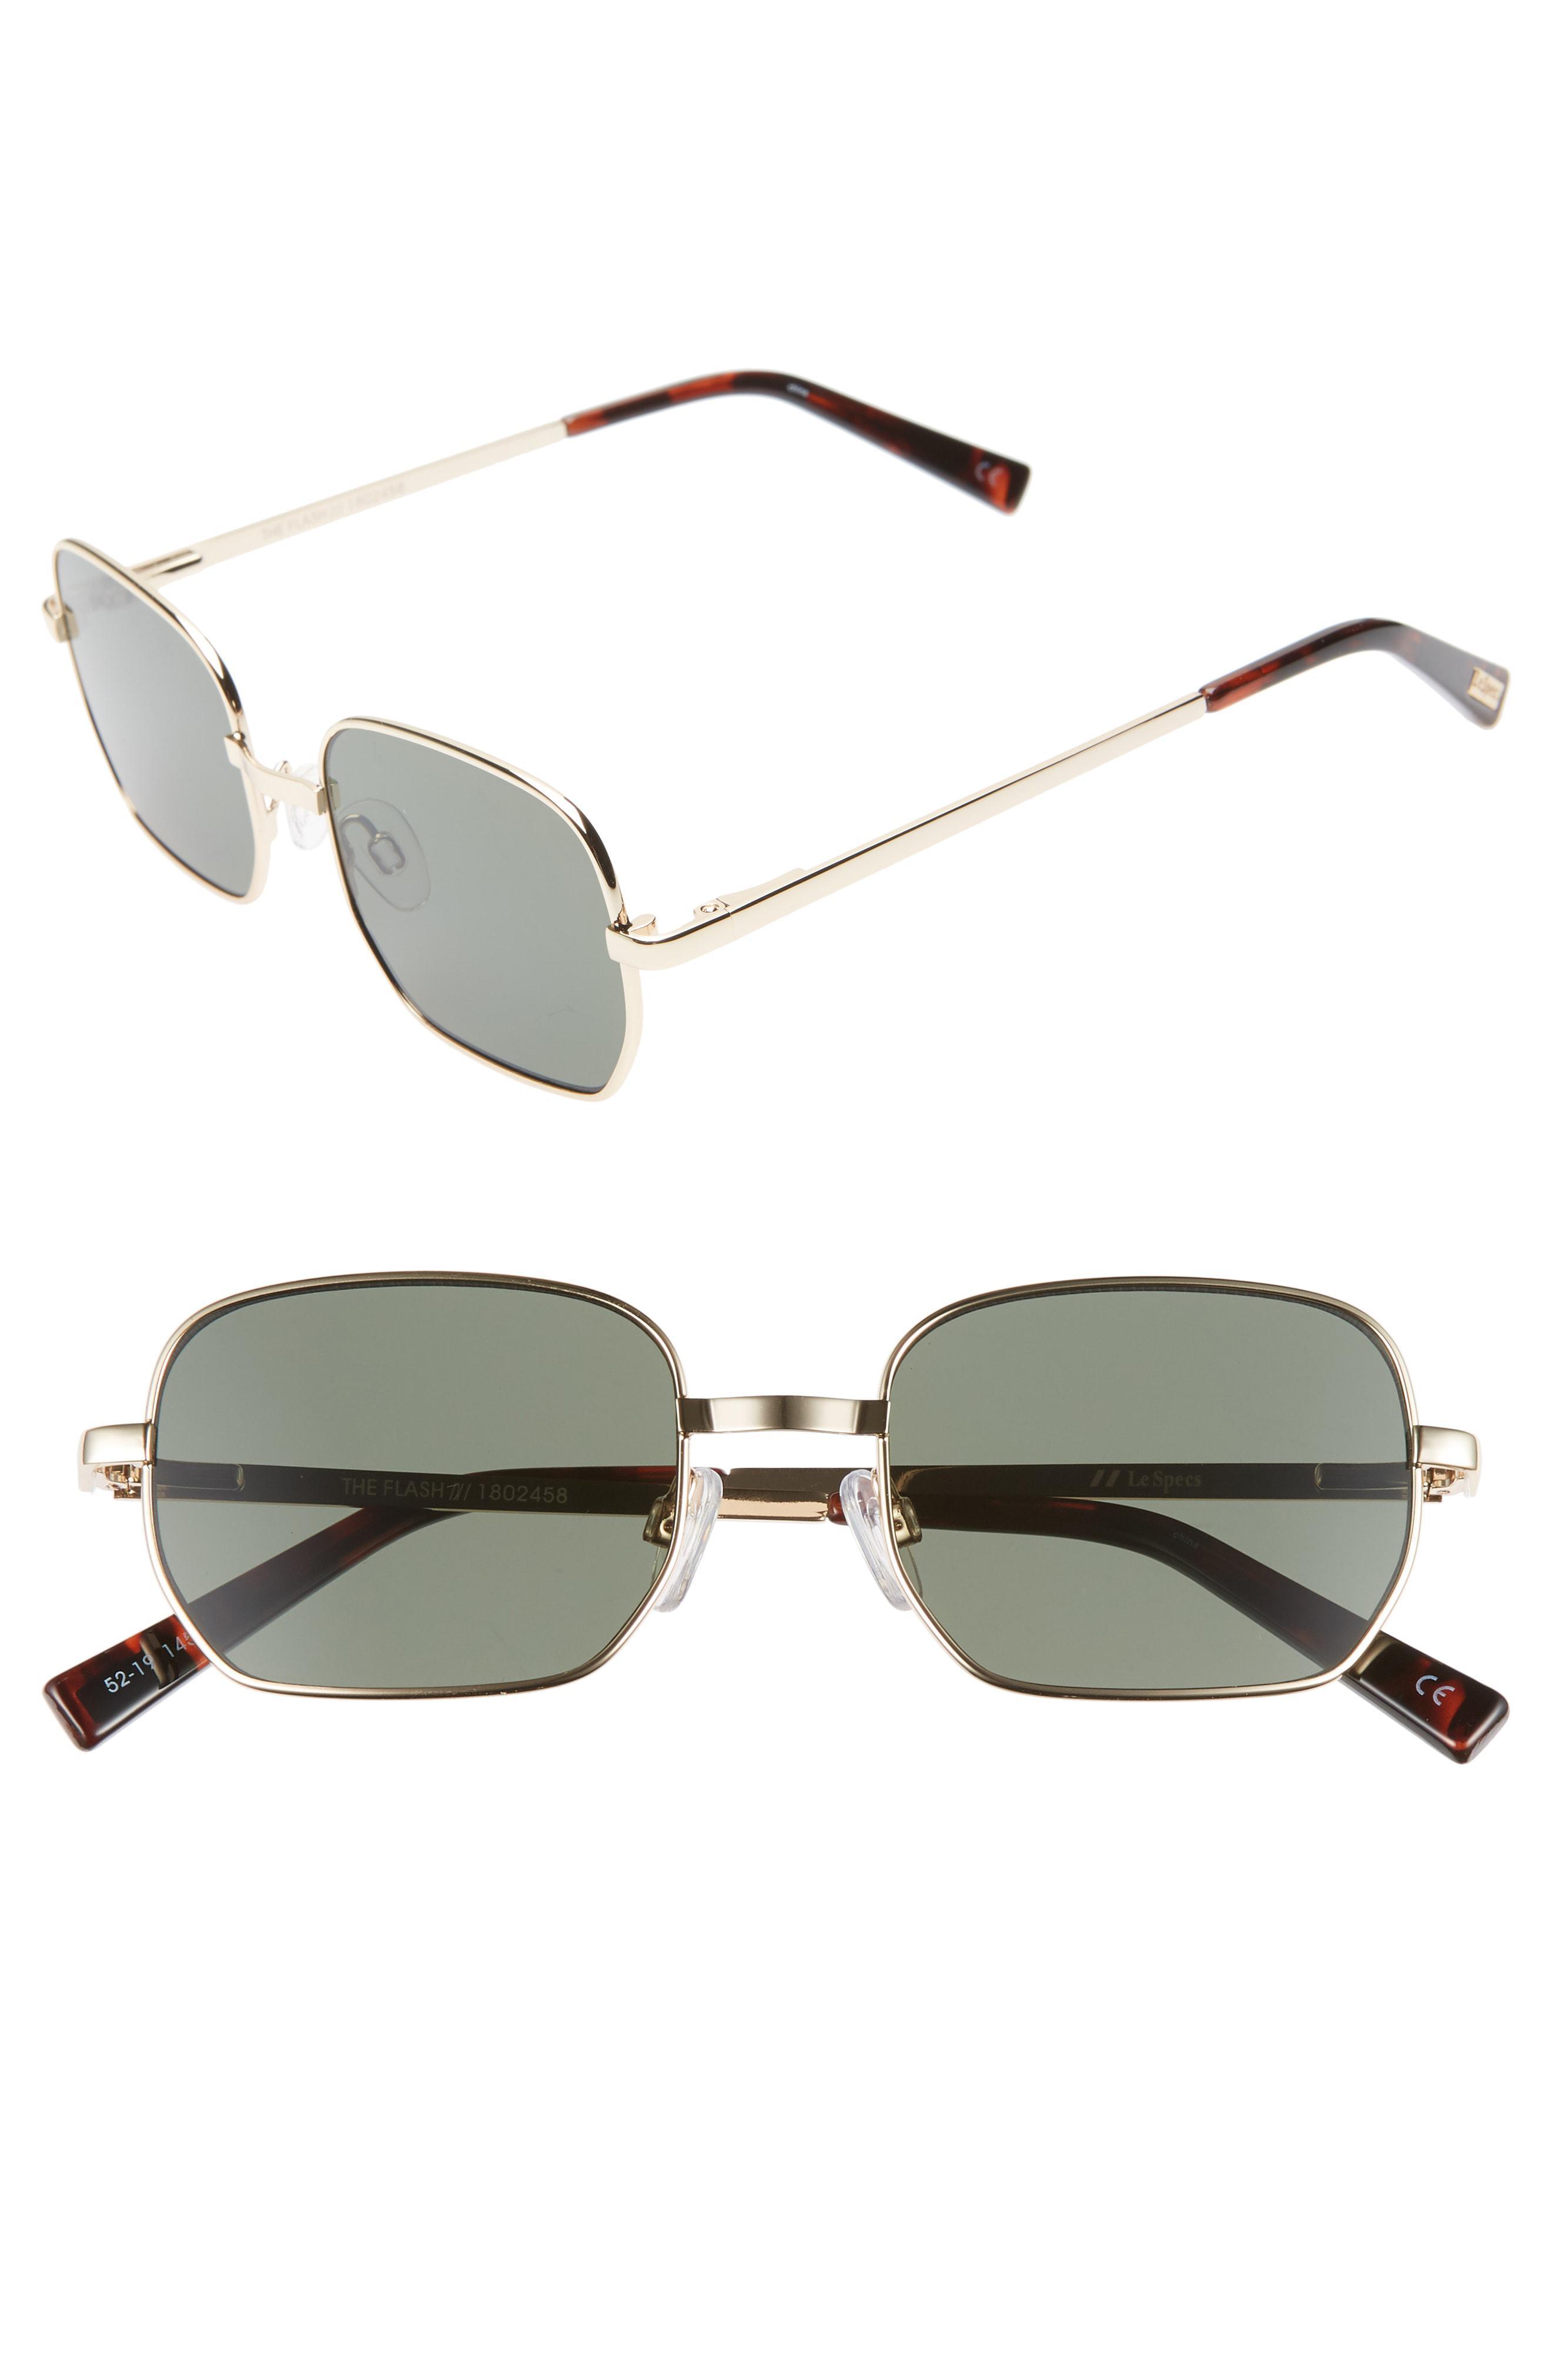 2661953f2f Lyst - Le Specs The Flash 52mm Round Sunglasses in Metallic